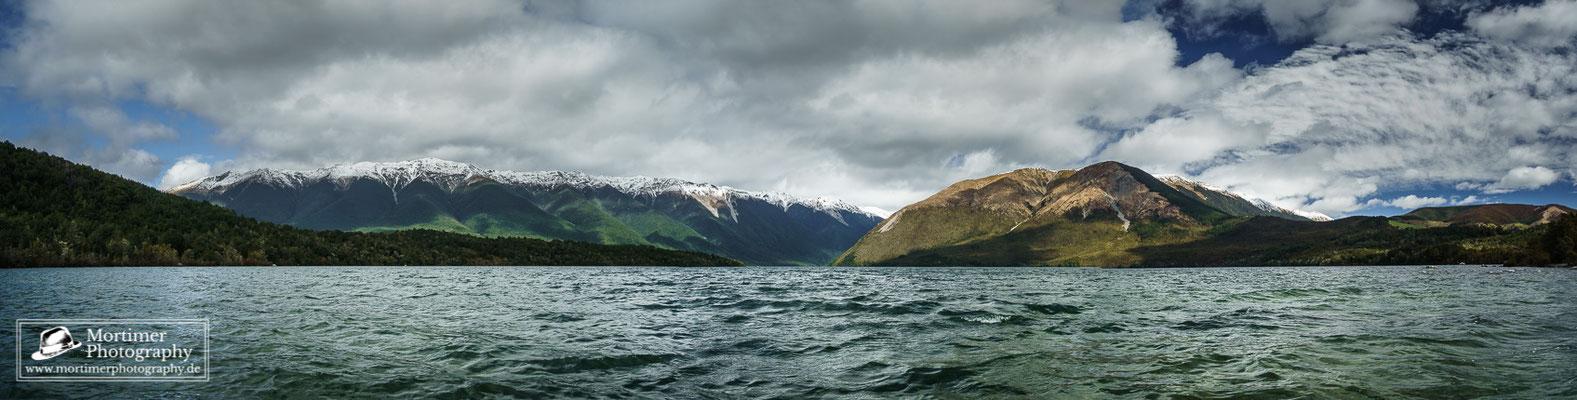 stunning mountain scenery with mount robert from lakeside of lake rototiti